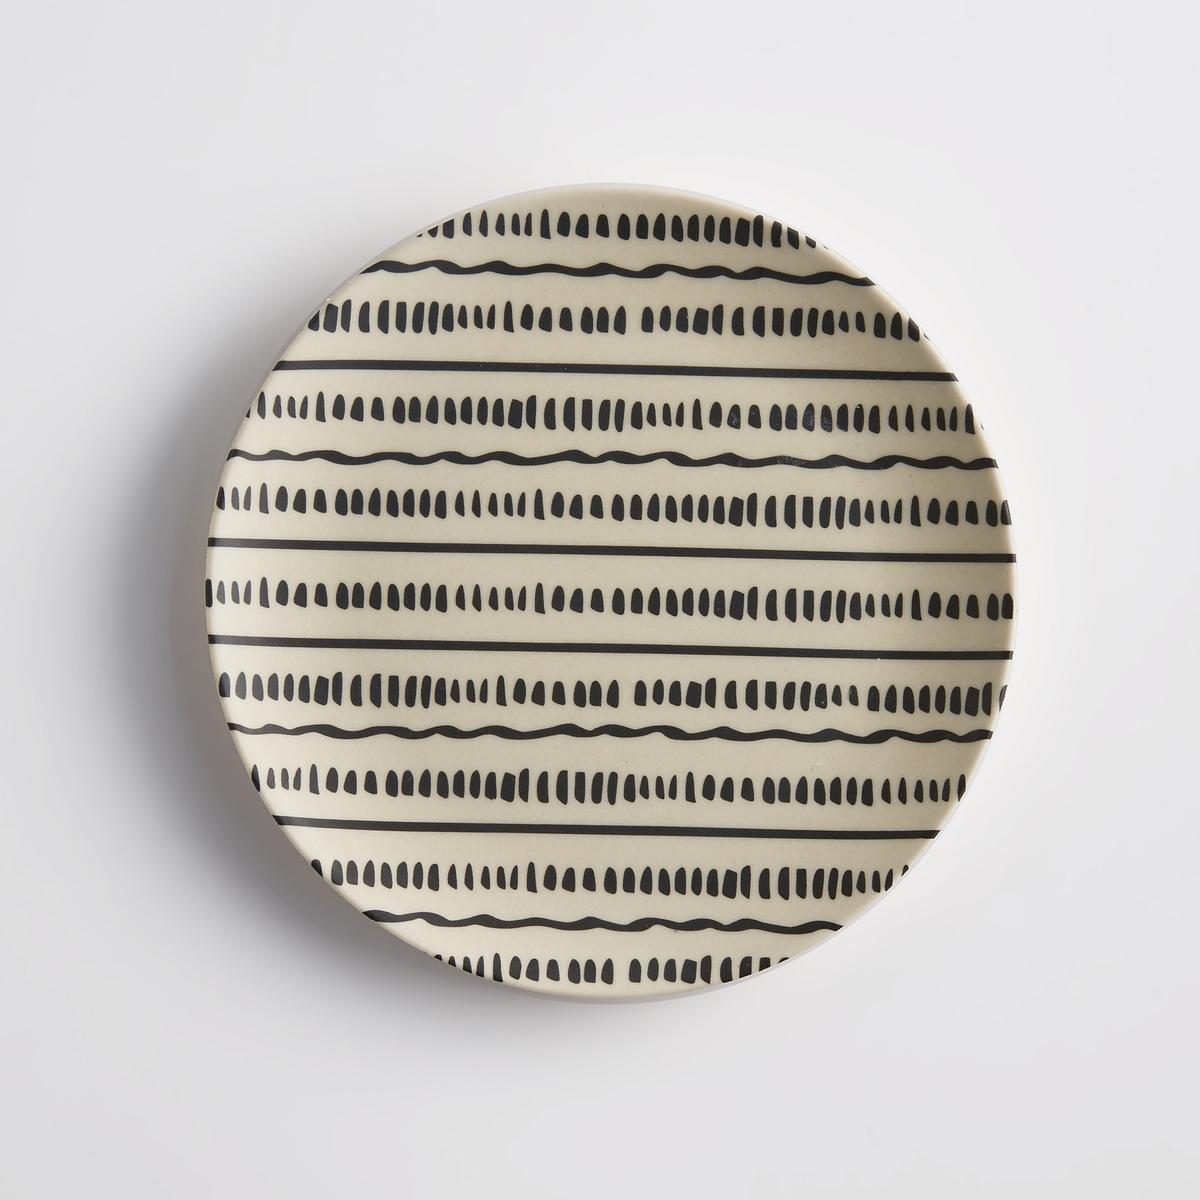 Комплект из 4 десертных тарелок из бамбука Bamboska